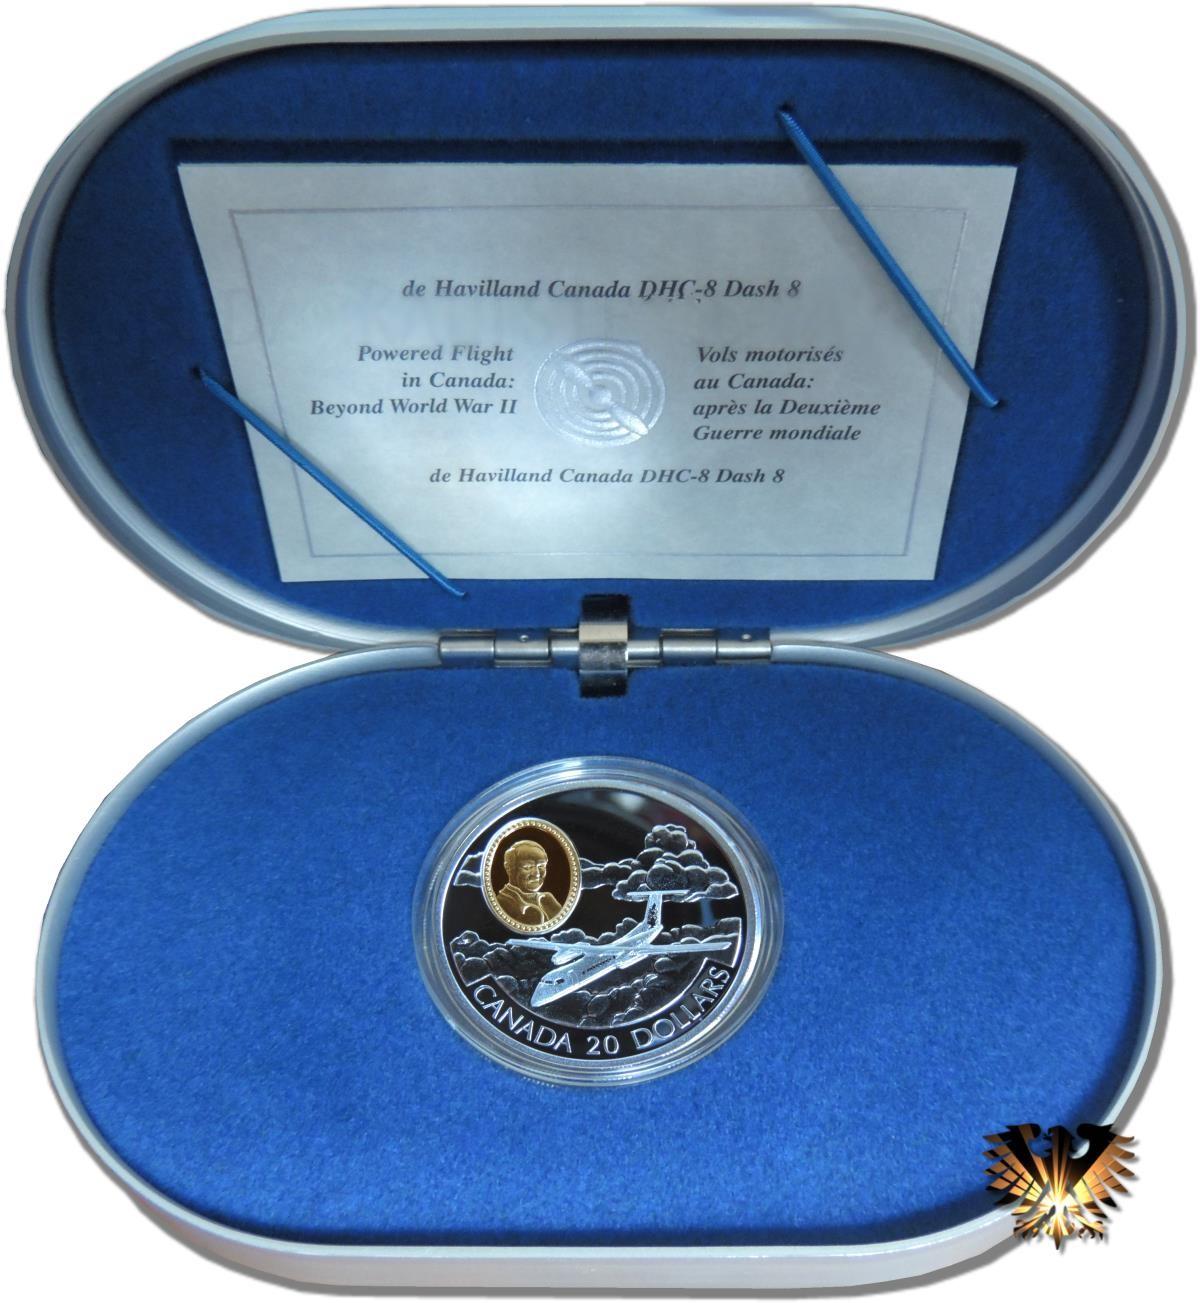 20 Dollars Canada 1999 Flugzeug Dhc 8 Silbermünze Vergoldung